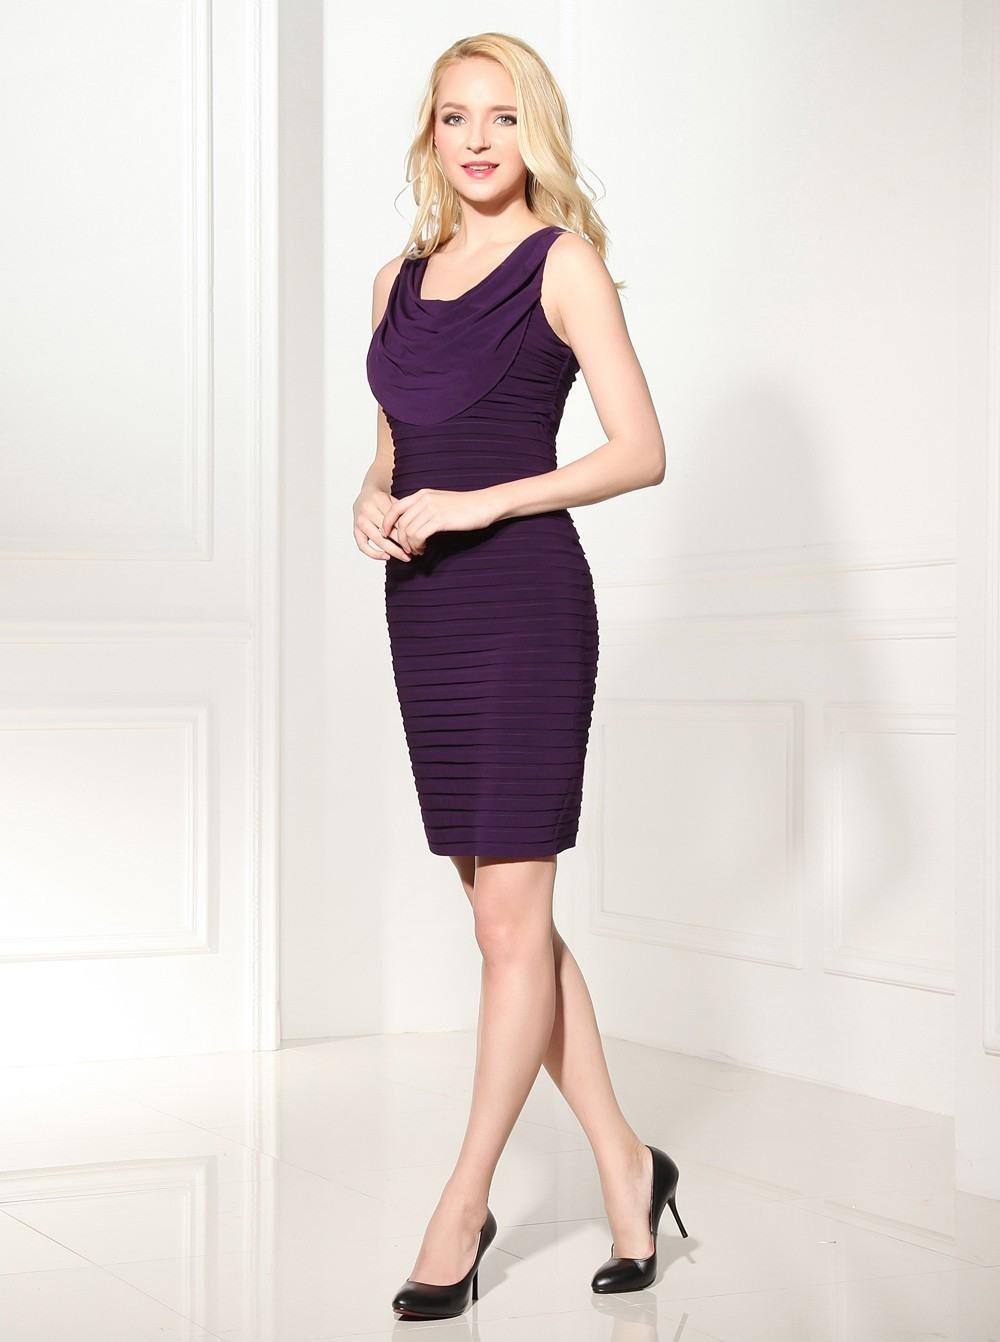 Designer Luxurius Kleid Eng Vertrieb15 Top Kleid Eng Vertrieb